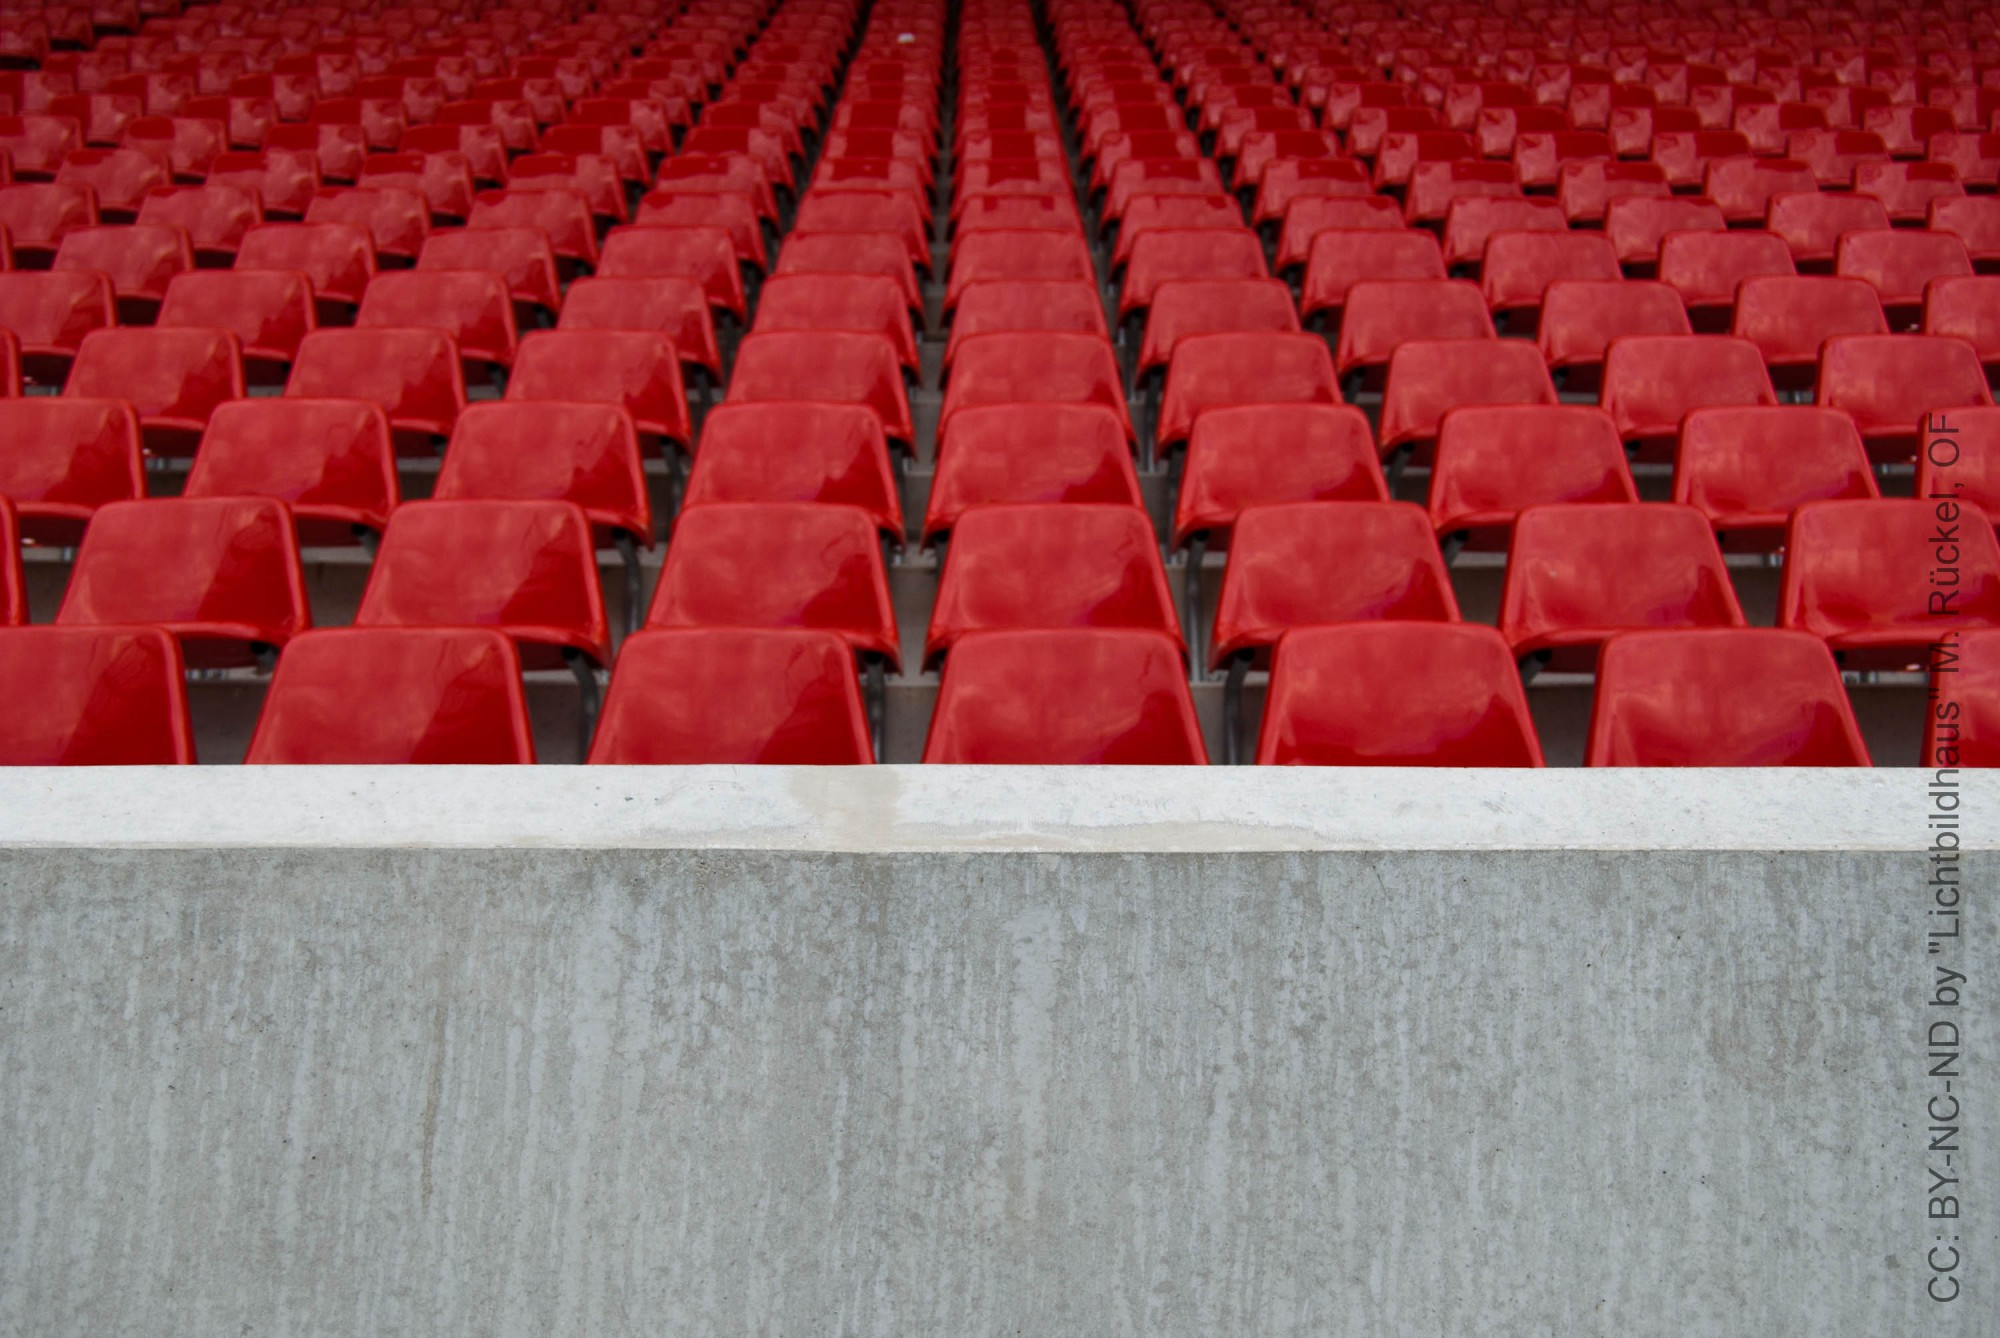 20140506-Kickers-Stadion-Offenbach-DSC_5946-2000x1338